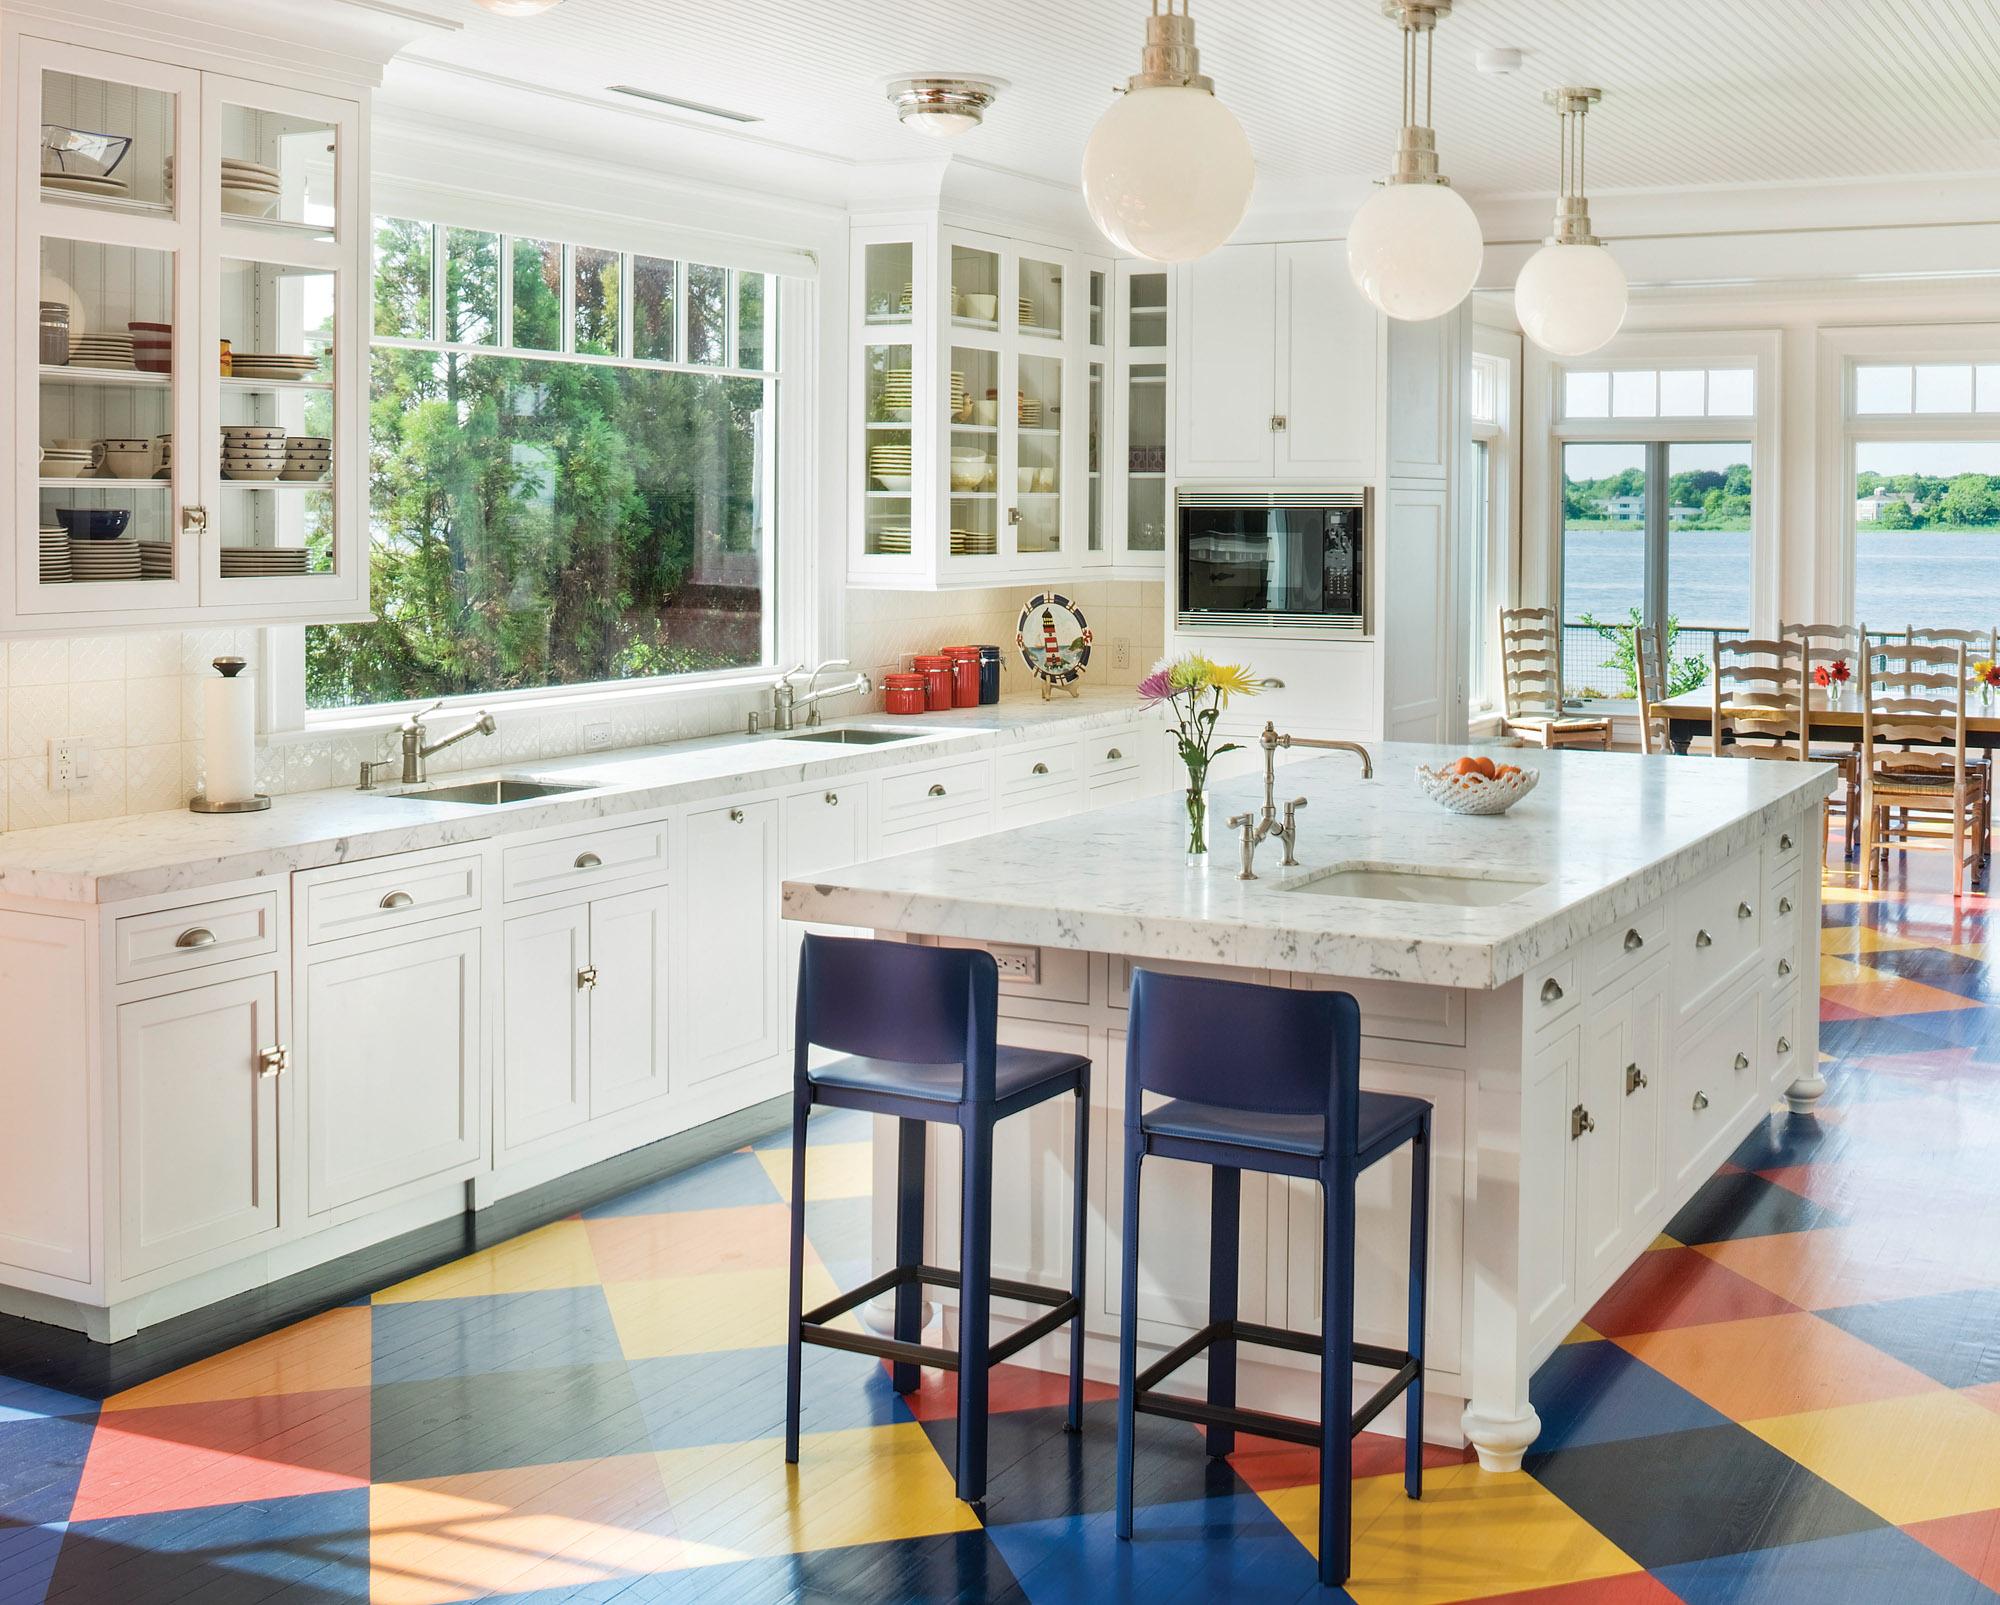 Colorful Kitchen Floor - Old House Journal Magazine on Kitchen  id=45975